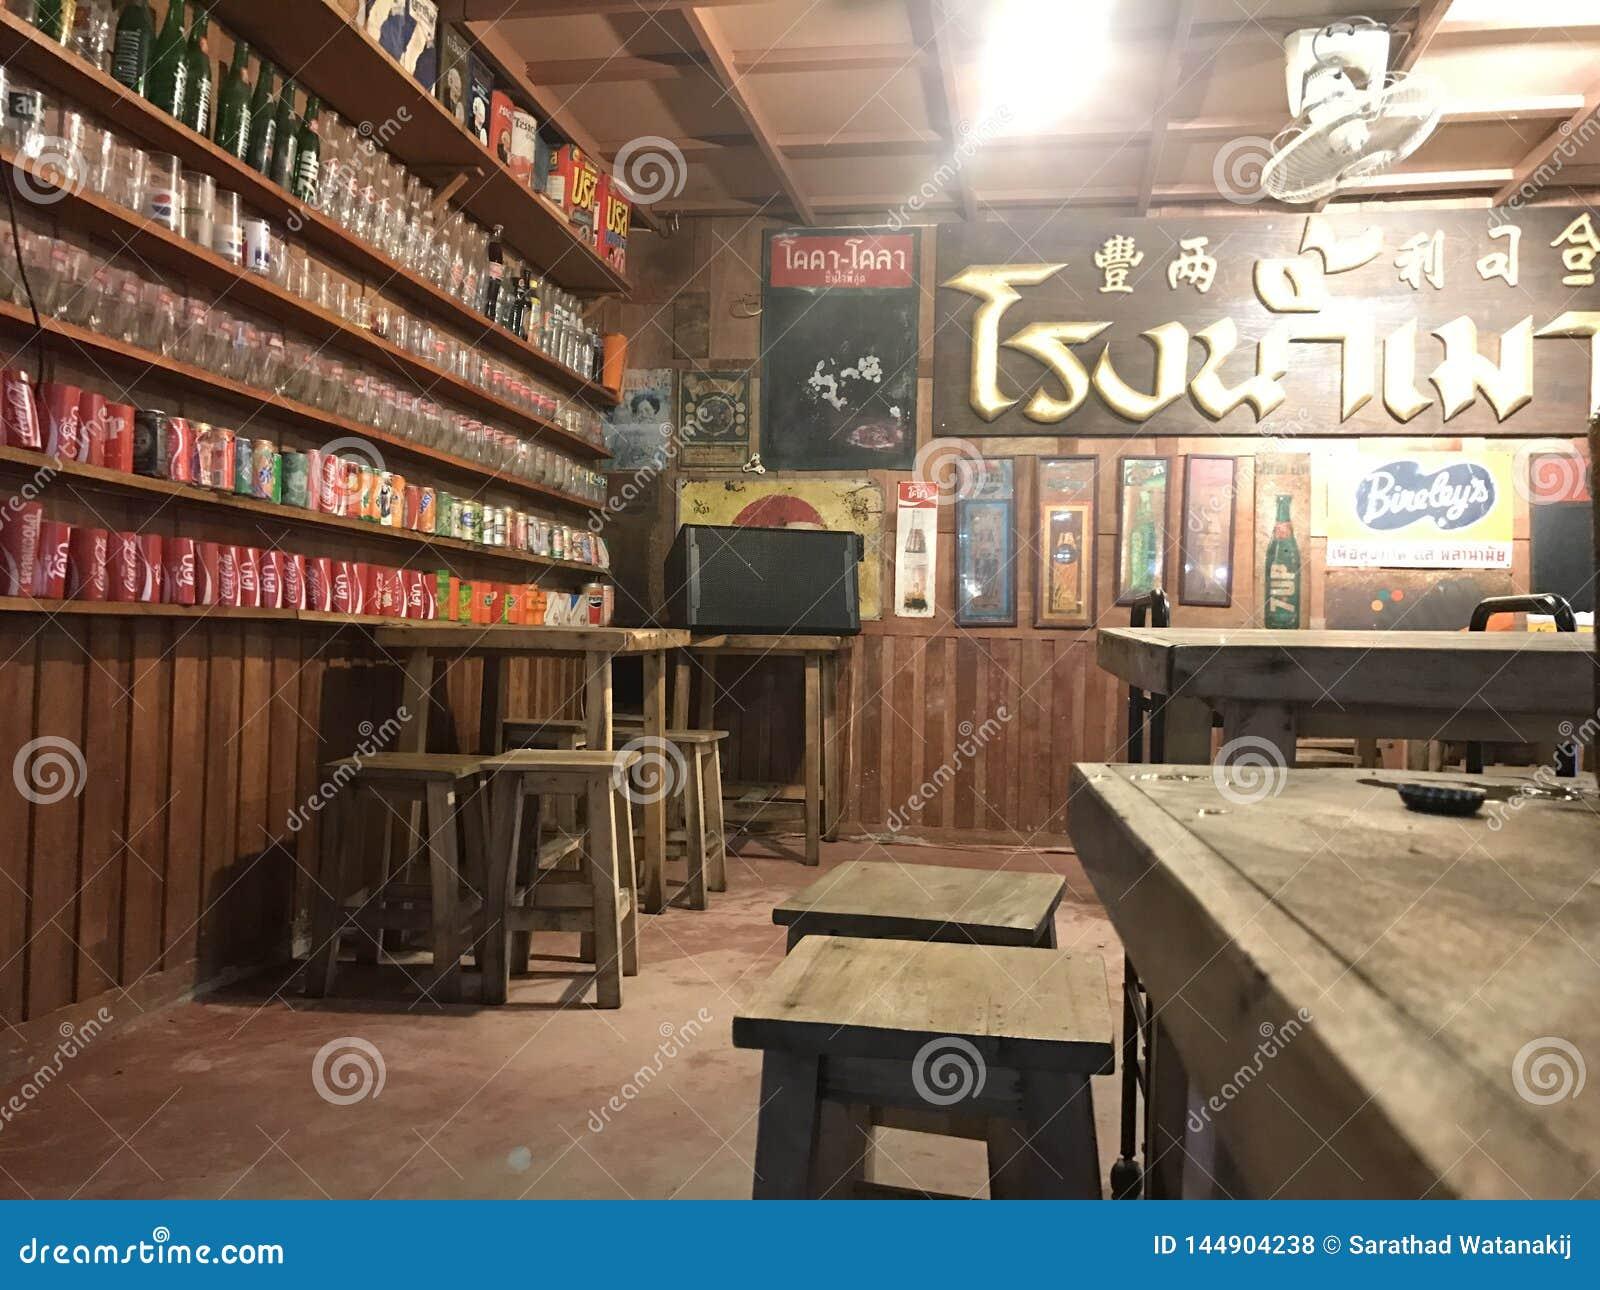 Stara szkoła bar&restaurant